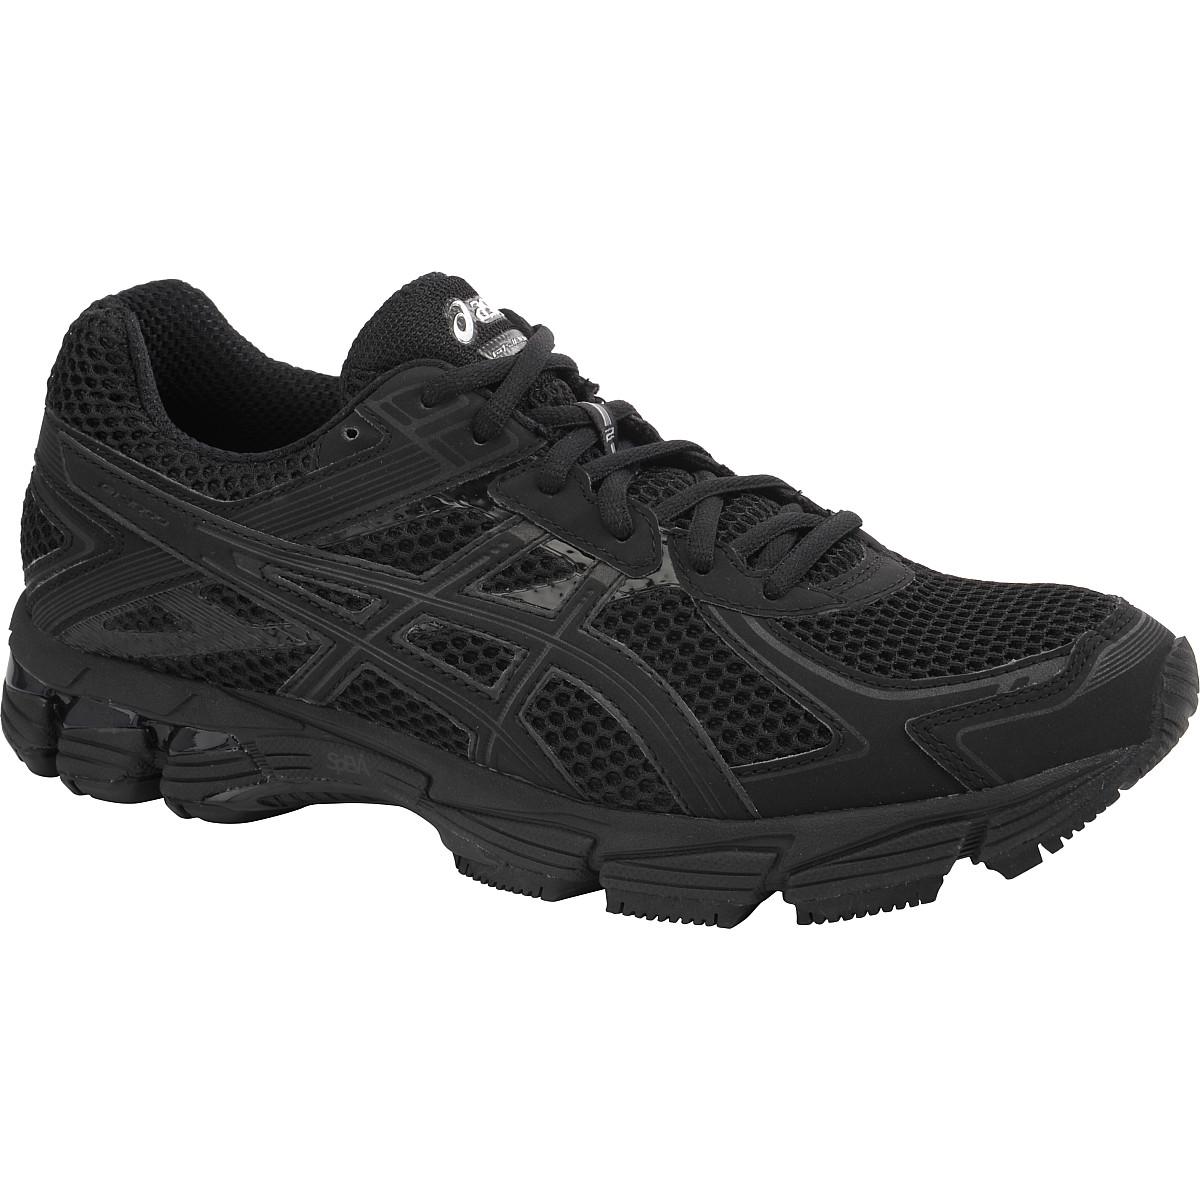 Asics GT 1000 2 running shoes